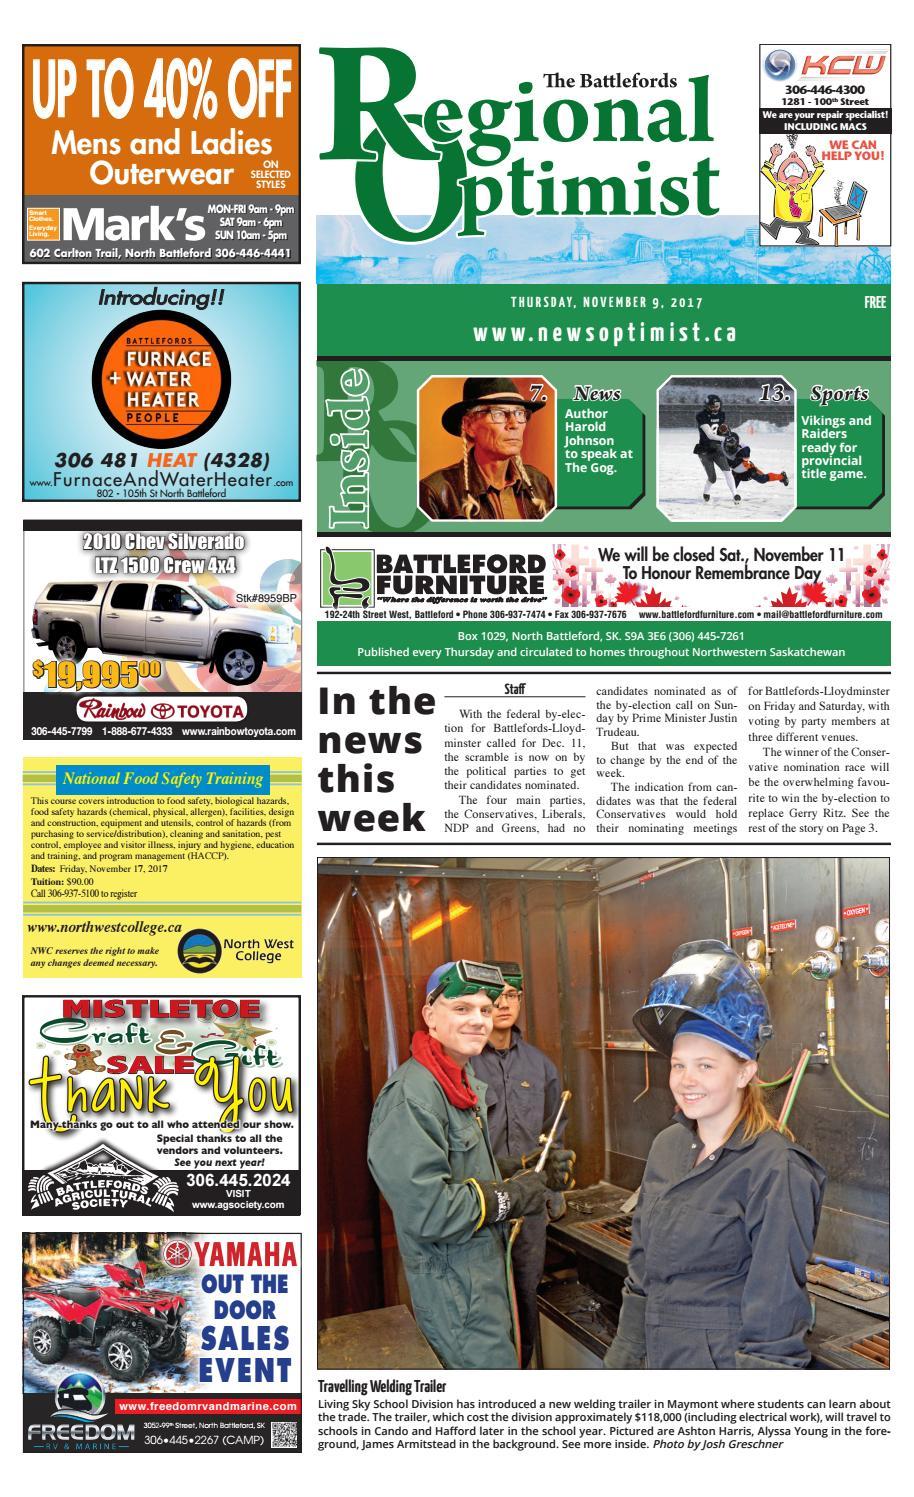 Regional Optimist November 9 by Battlefords News Optimist - issuu 9b7041a144a